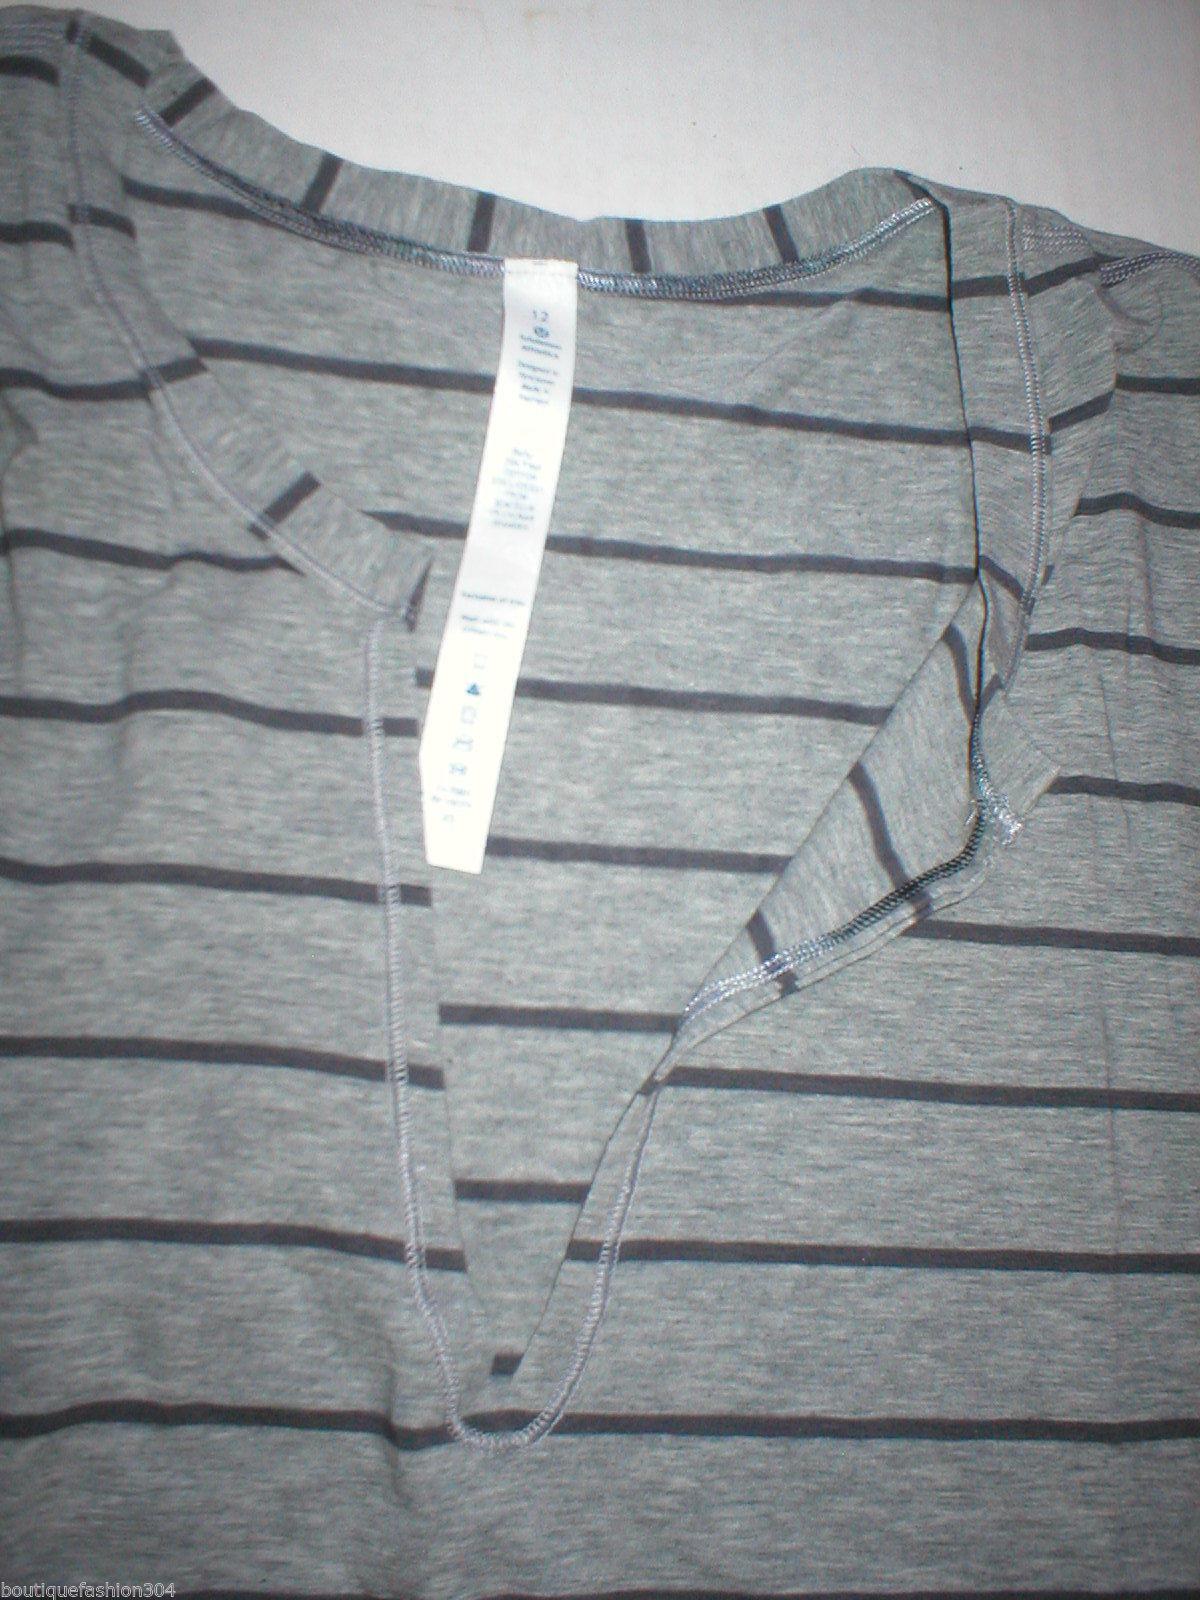 NWT Womens Lululemon New Yogi Cut Off Tee Top Shirt 10 12 Stripes Gray Yoga Soft